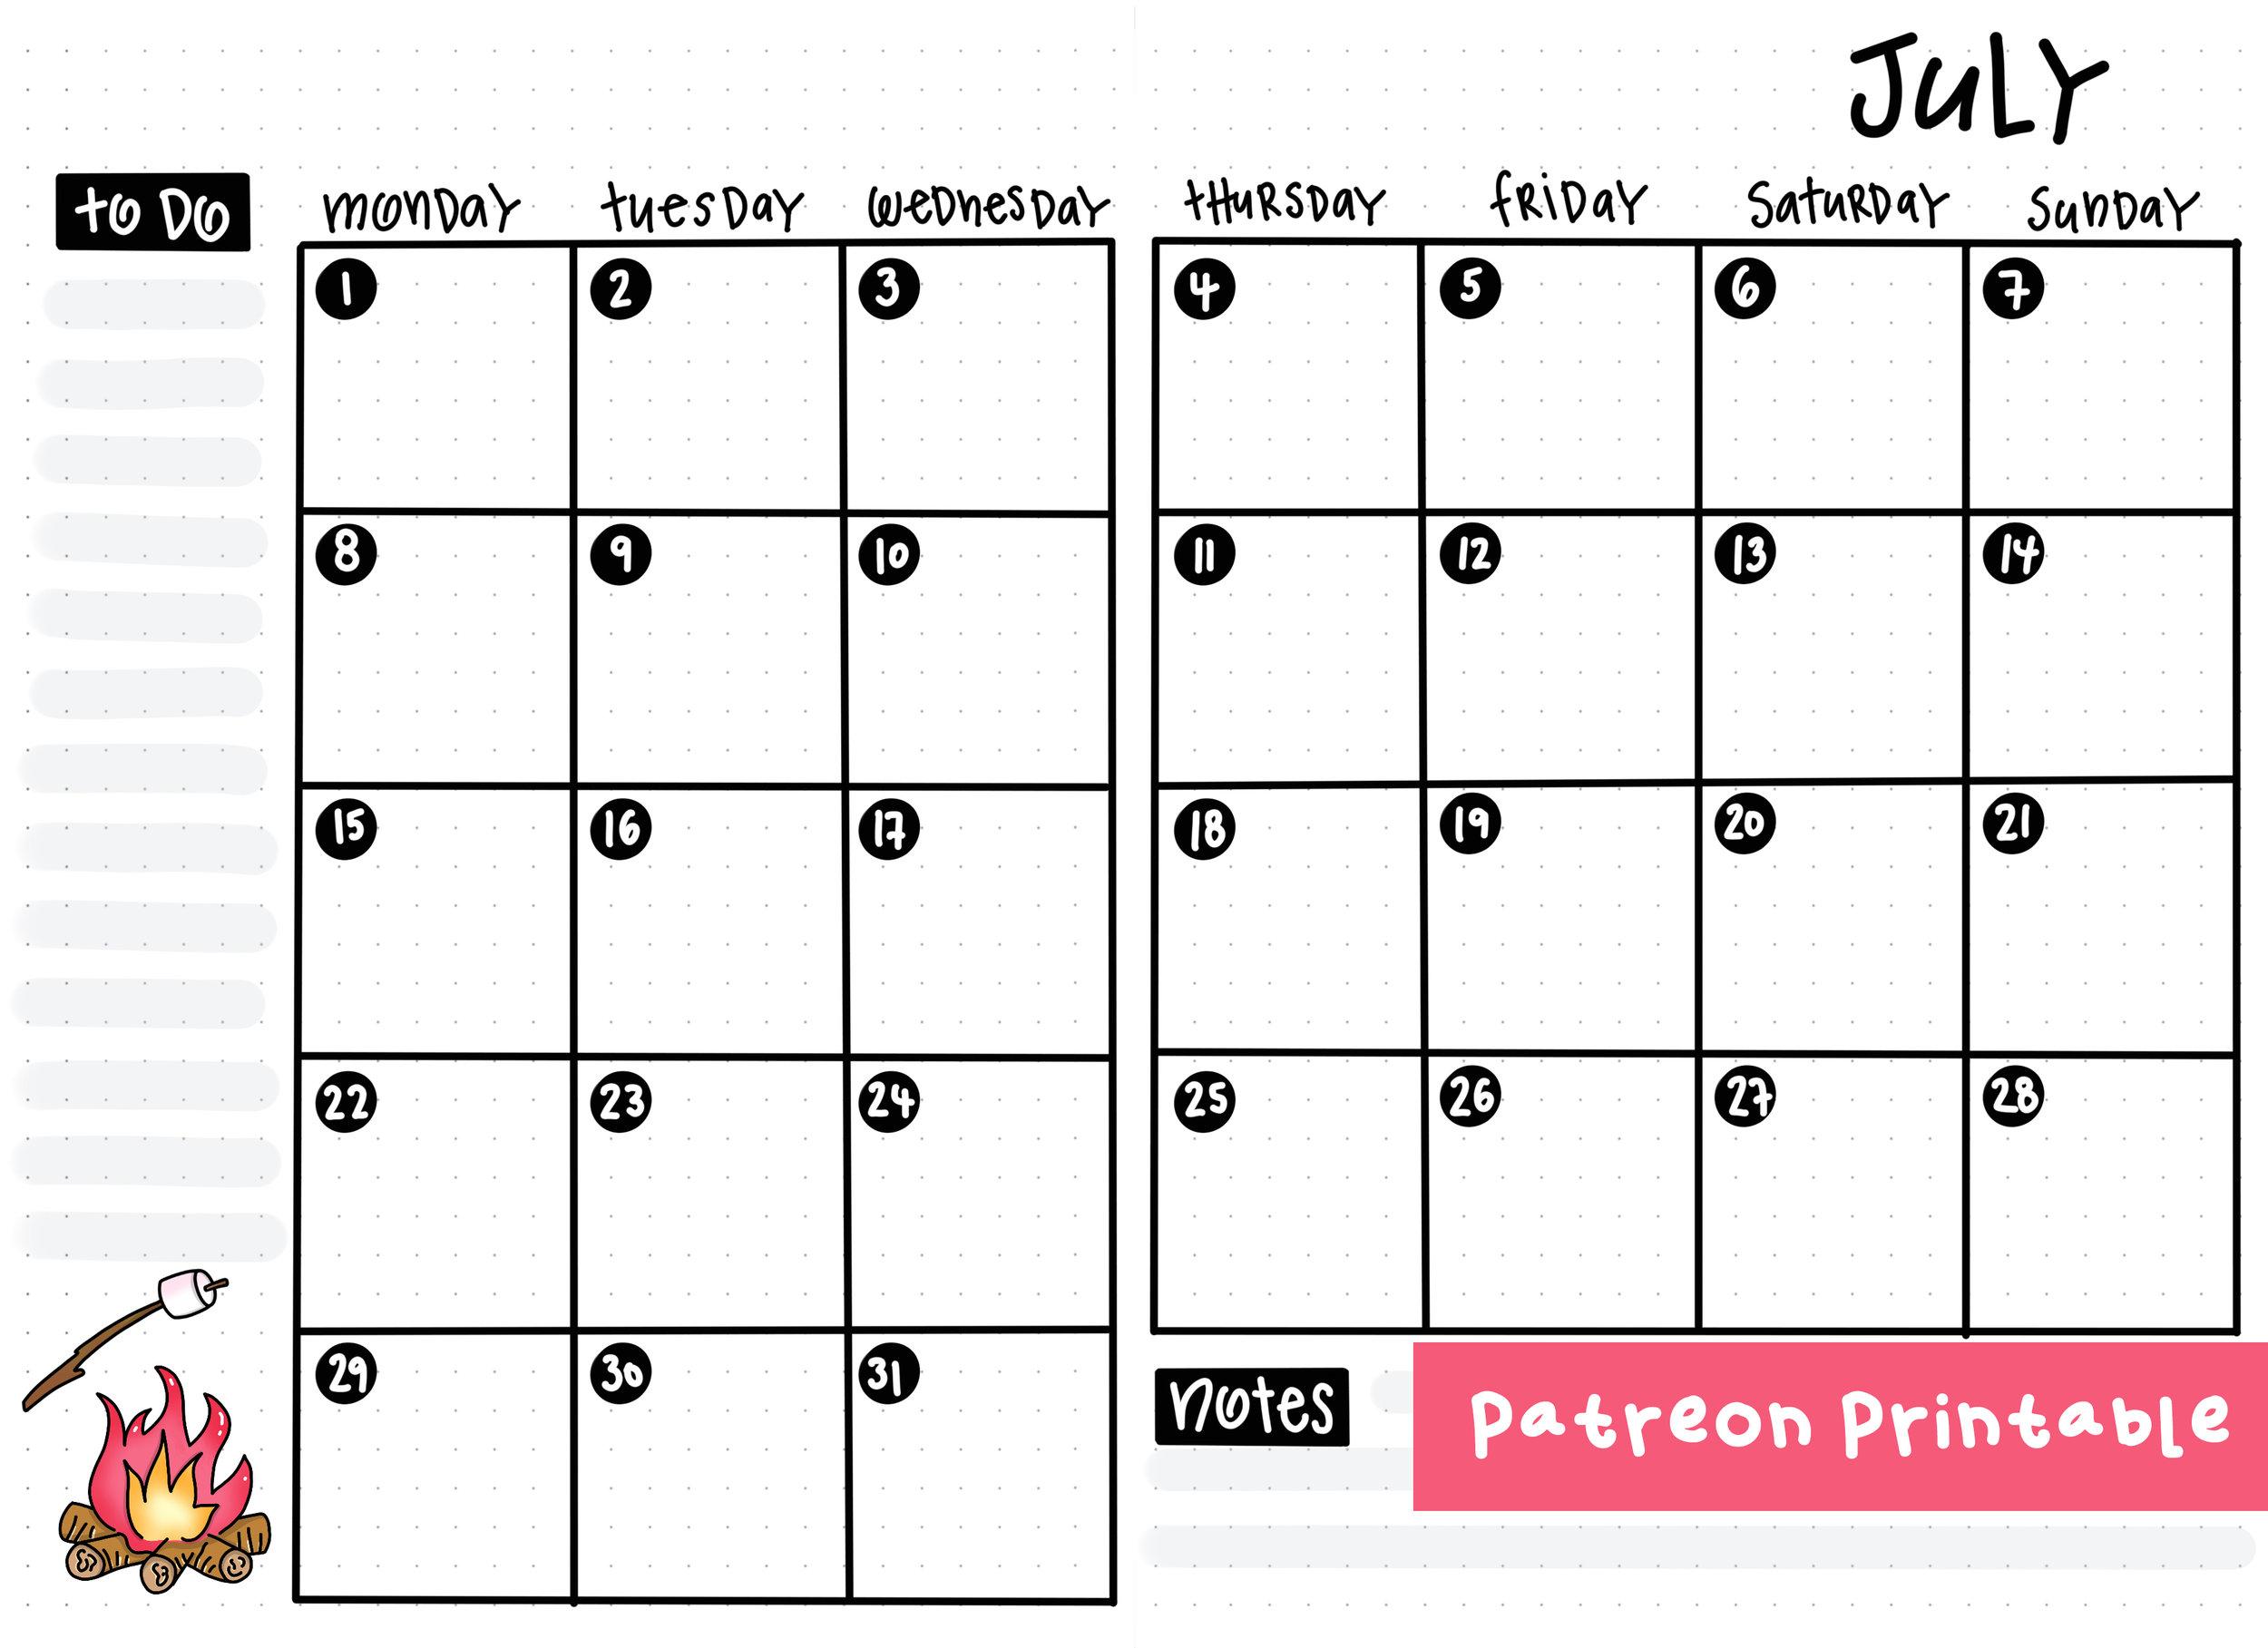 Patreon Printable - July 2019 Bullet Journal setup